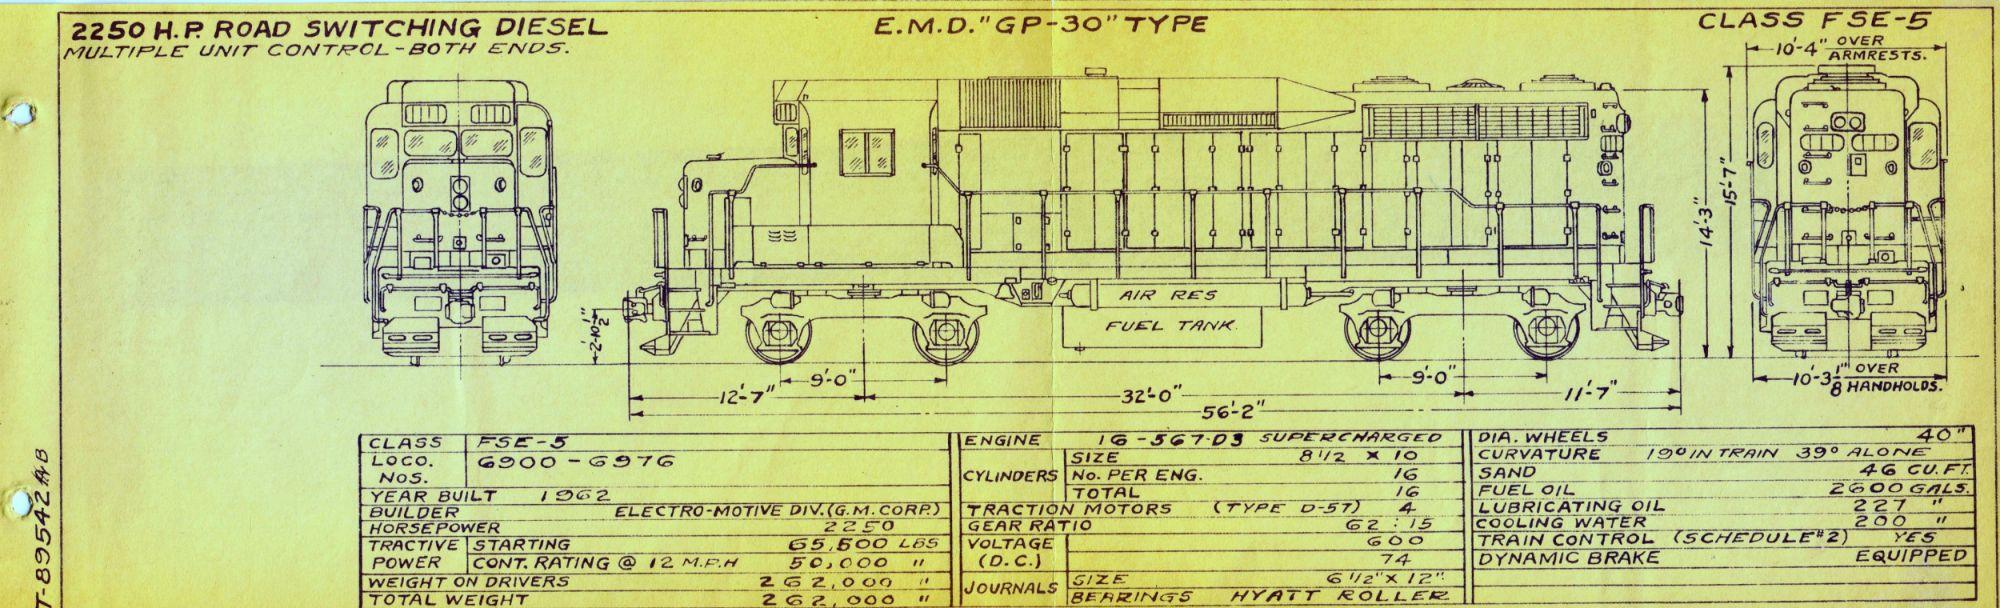 hight resolution of emd gp 30 type class fse 5